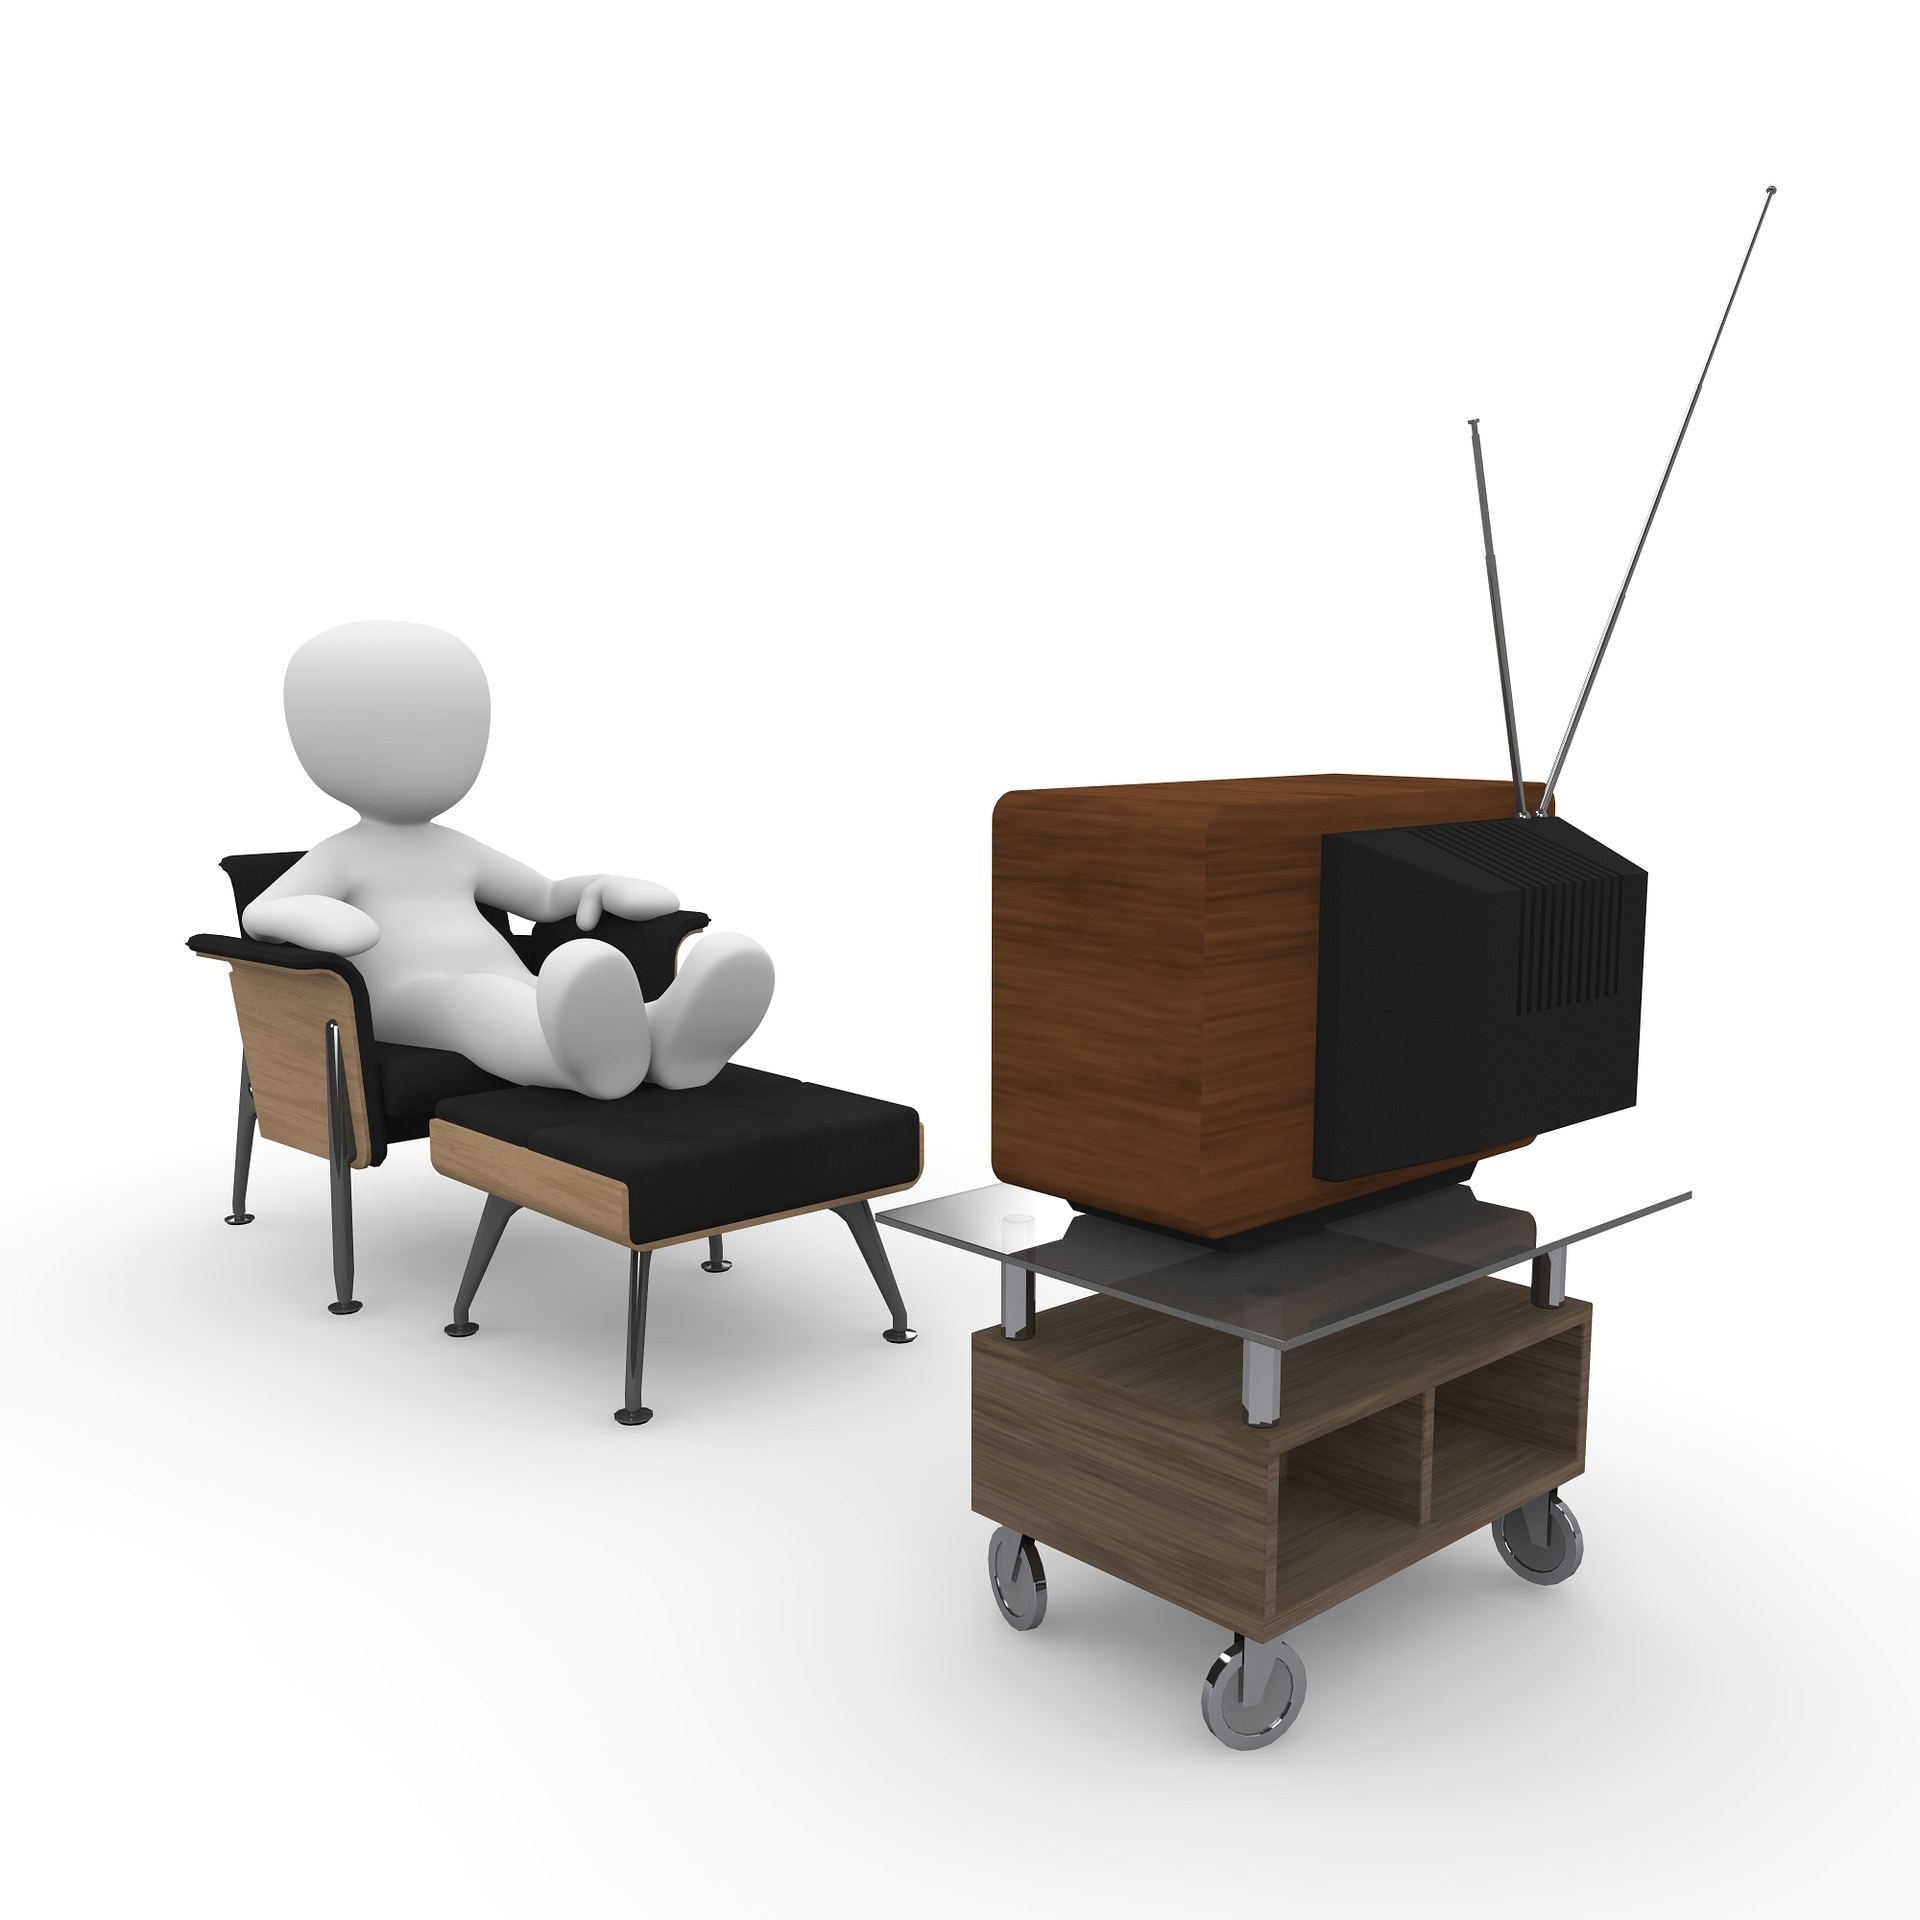 dTV、Hulu、U-NEXTほか、動画配信サービスの人気バラエティ番組おすすめランキング